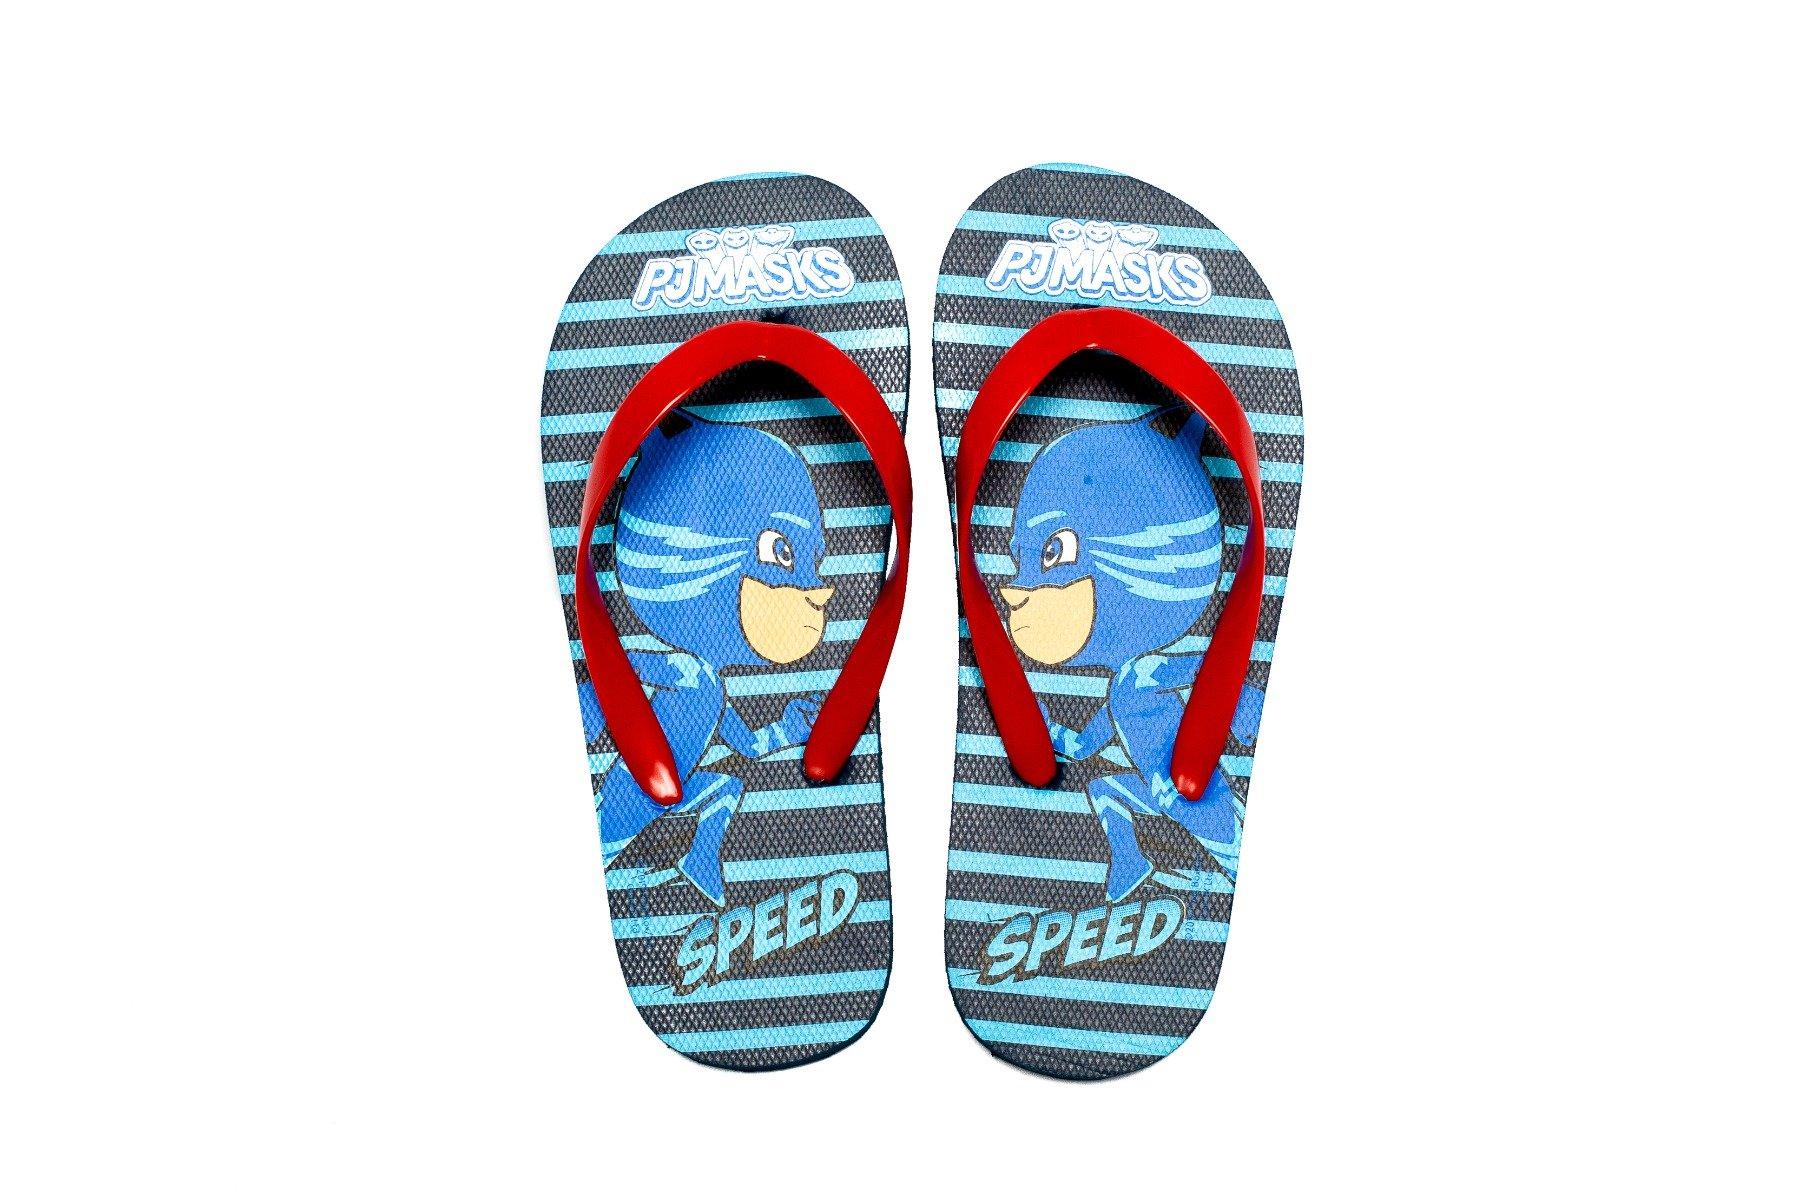 Papuci baieti Pj Masks, Speed, Rosu imagine